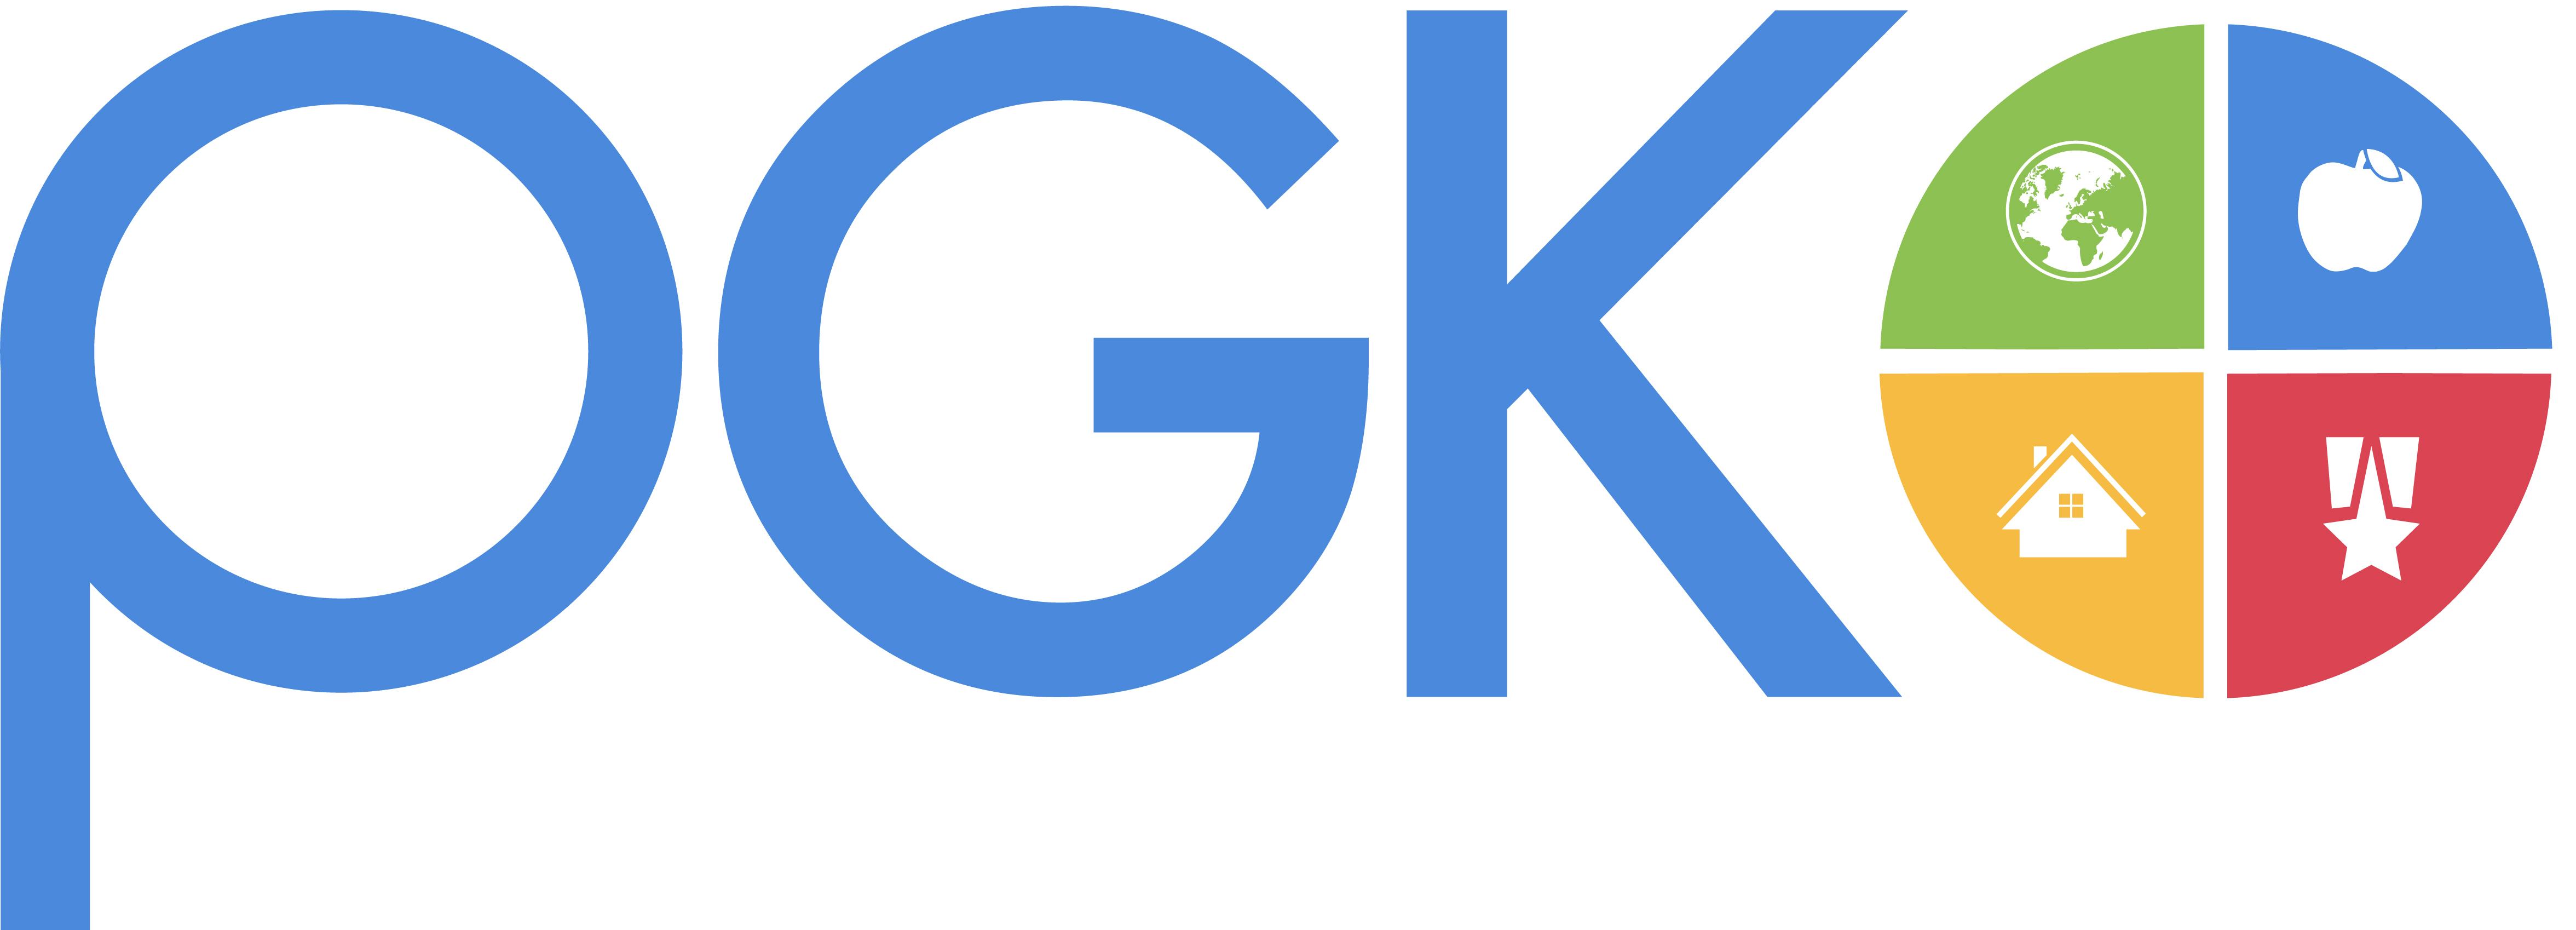 PGK logo